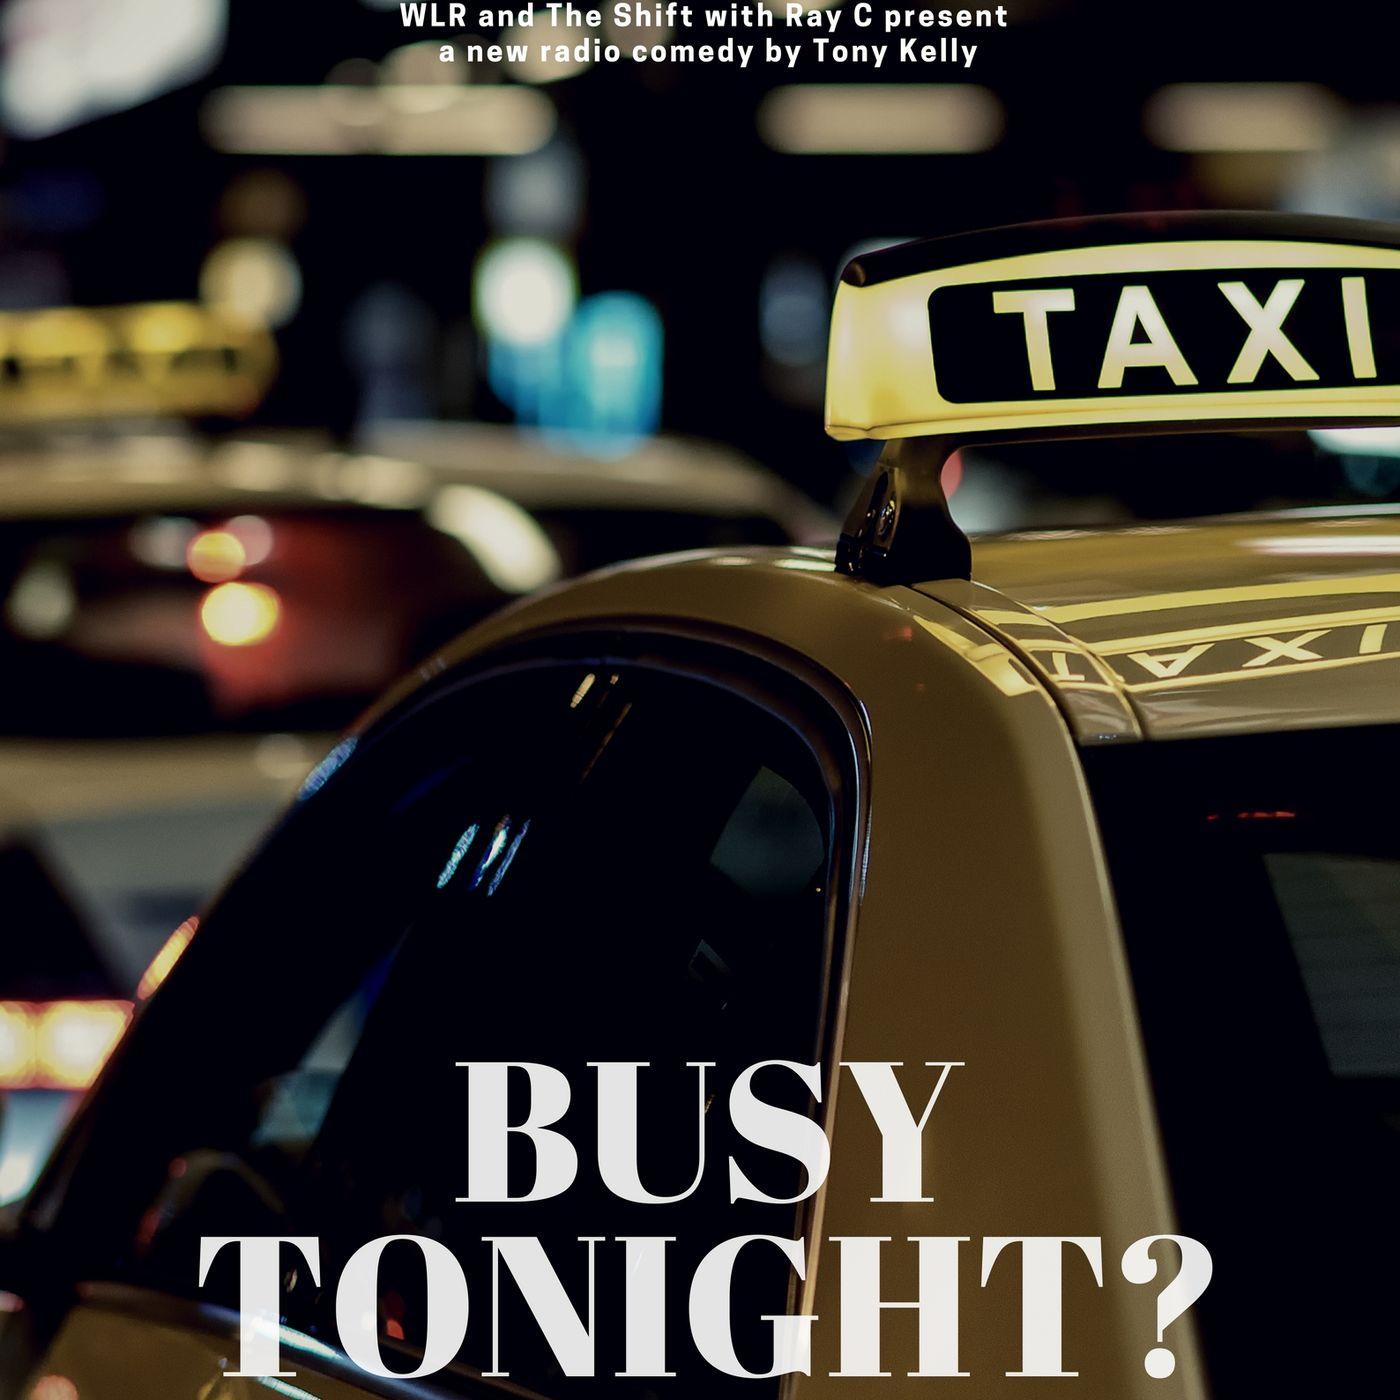 Busy Tonight?